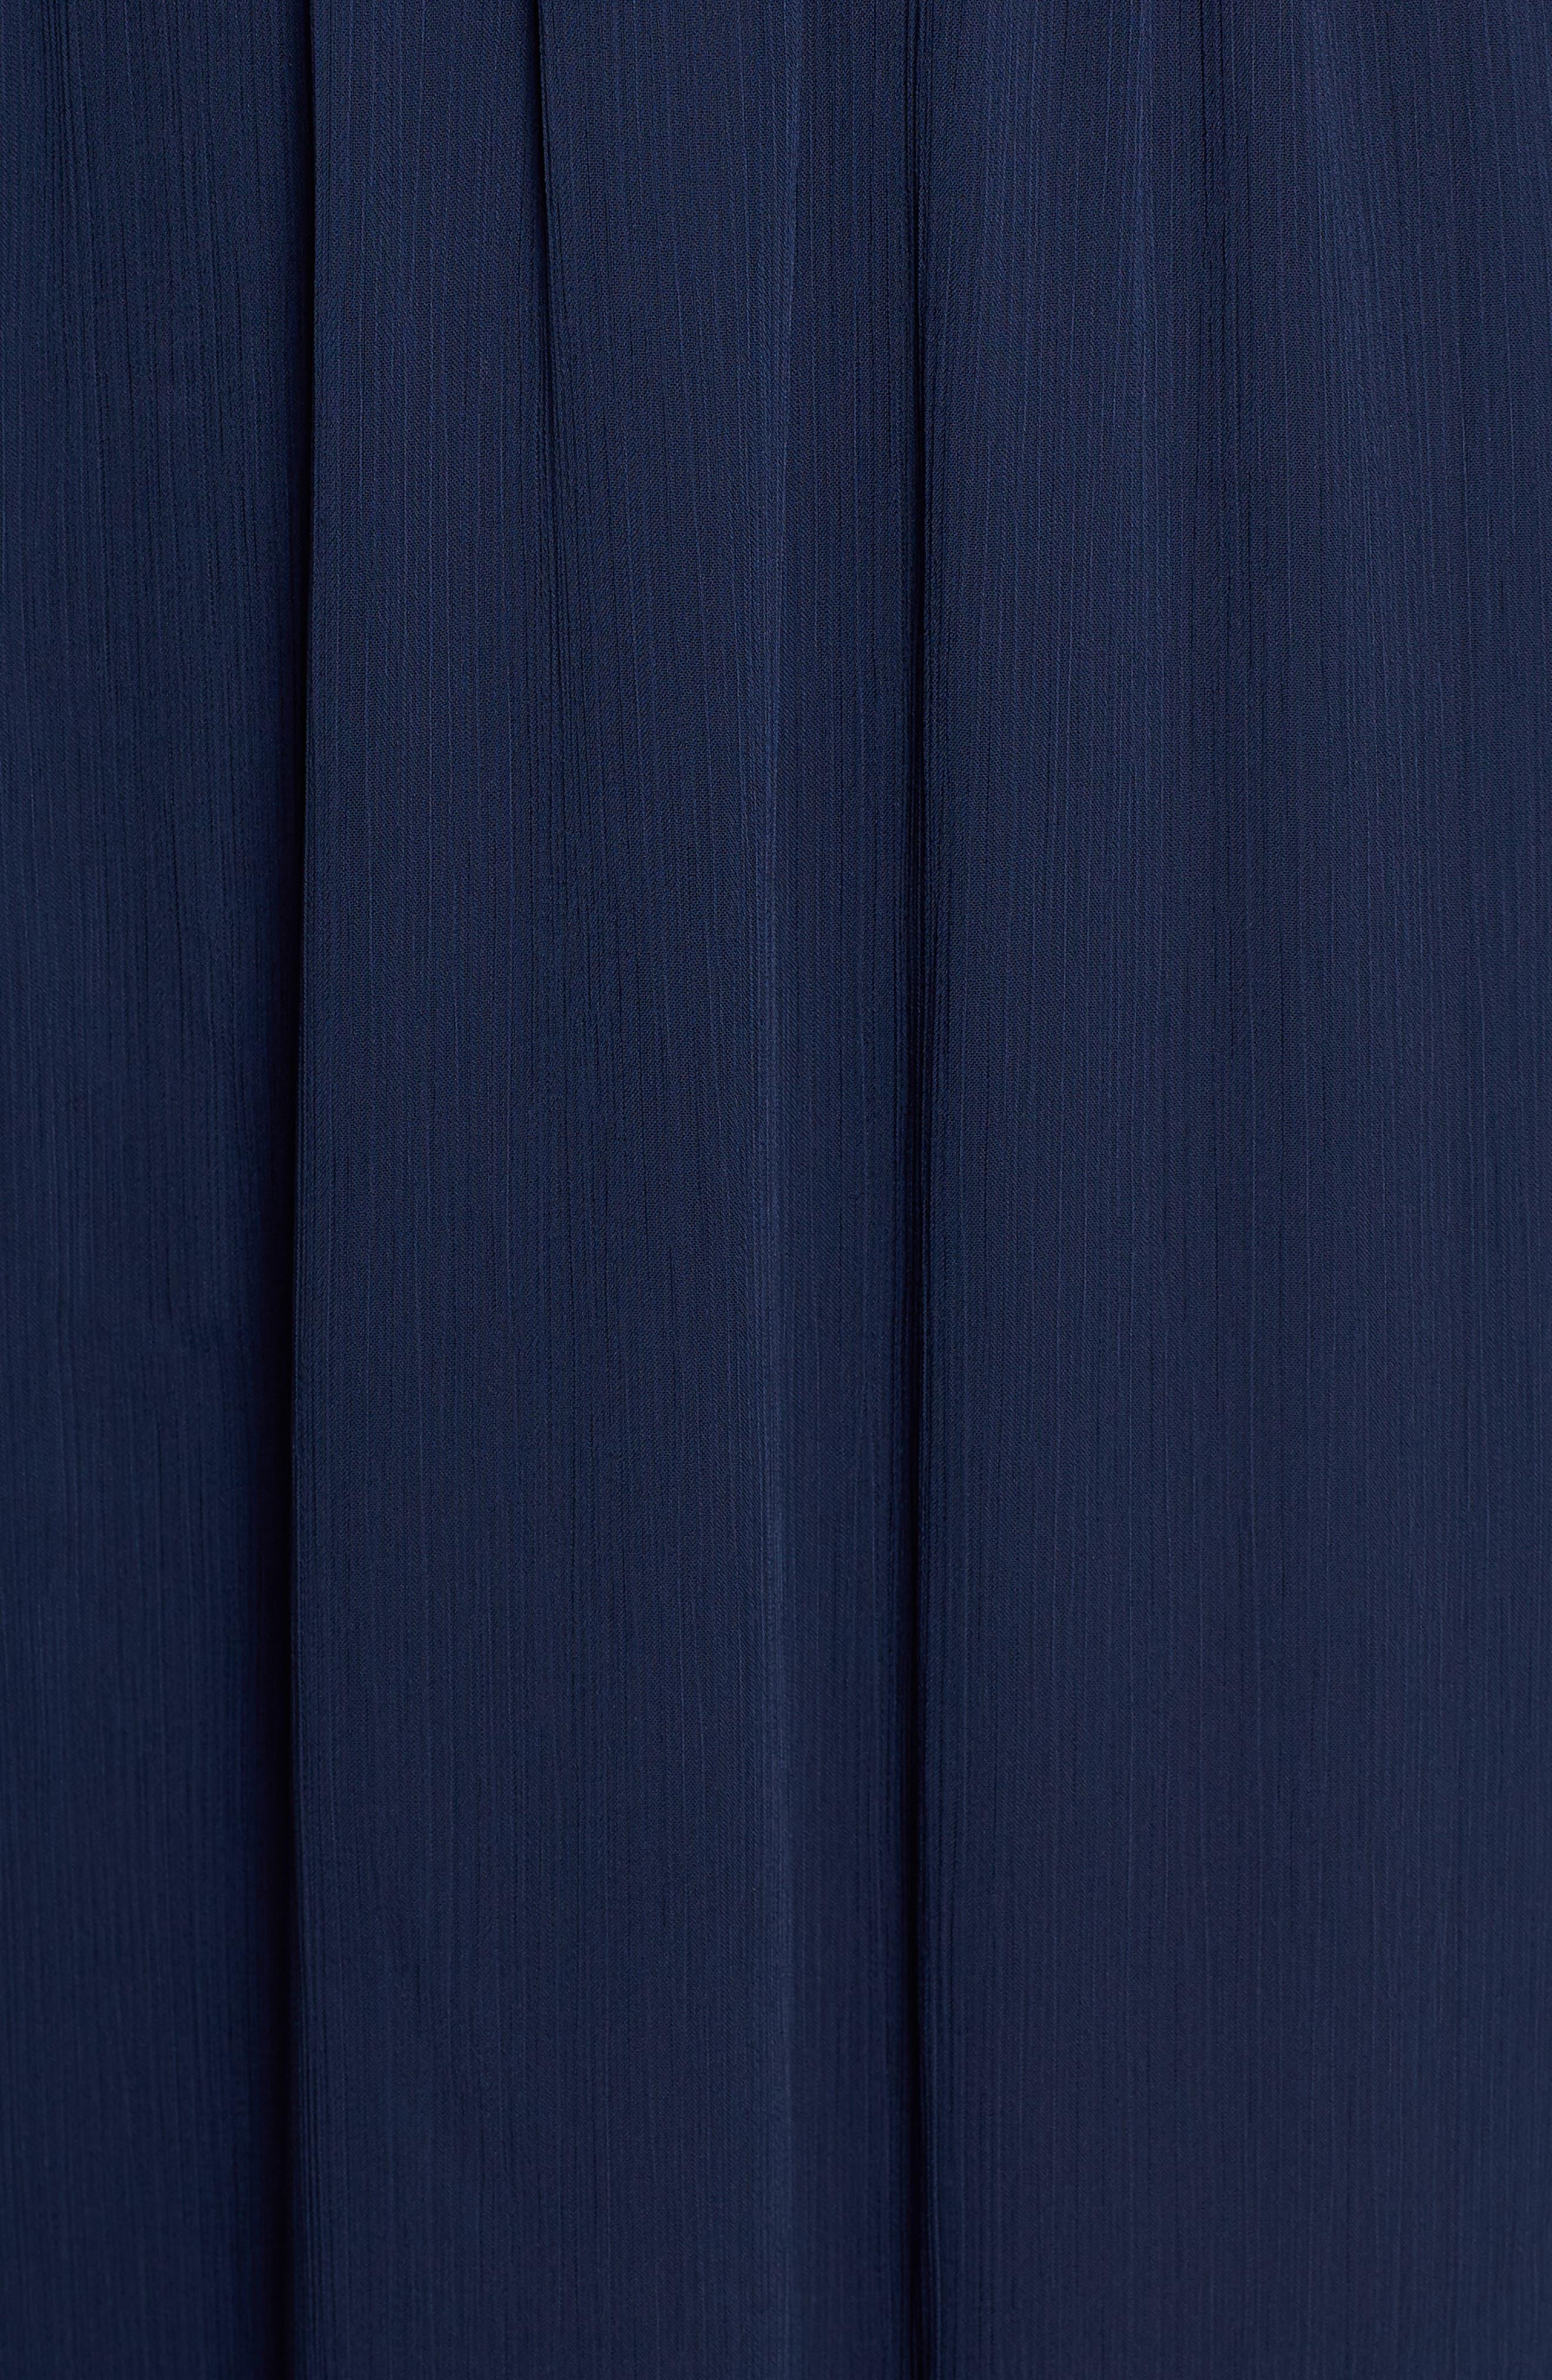 Satin Trim Chiffon Dress,                             Alternate thumbnail 6, color,                             NAVY